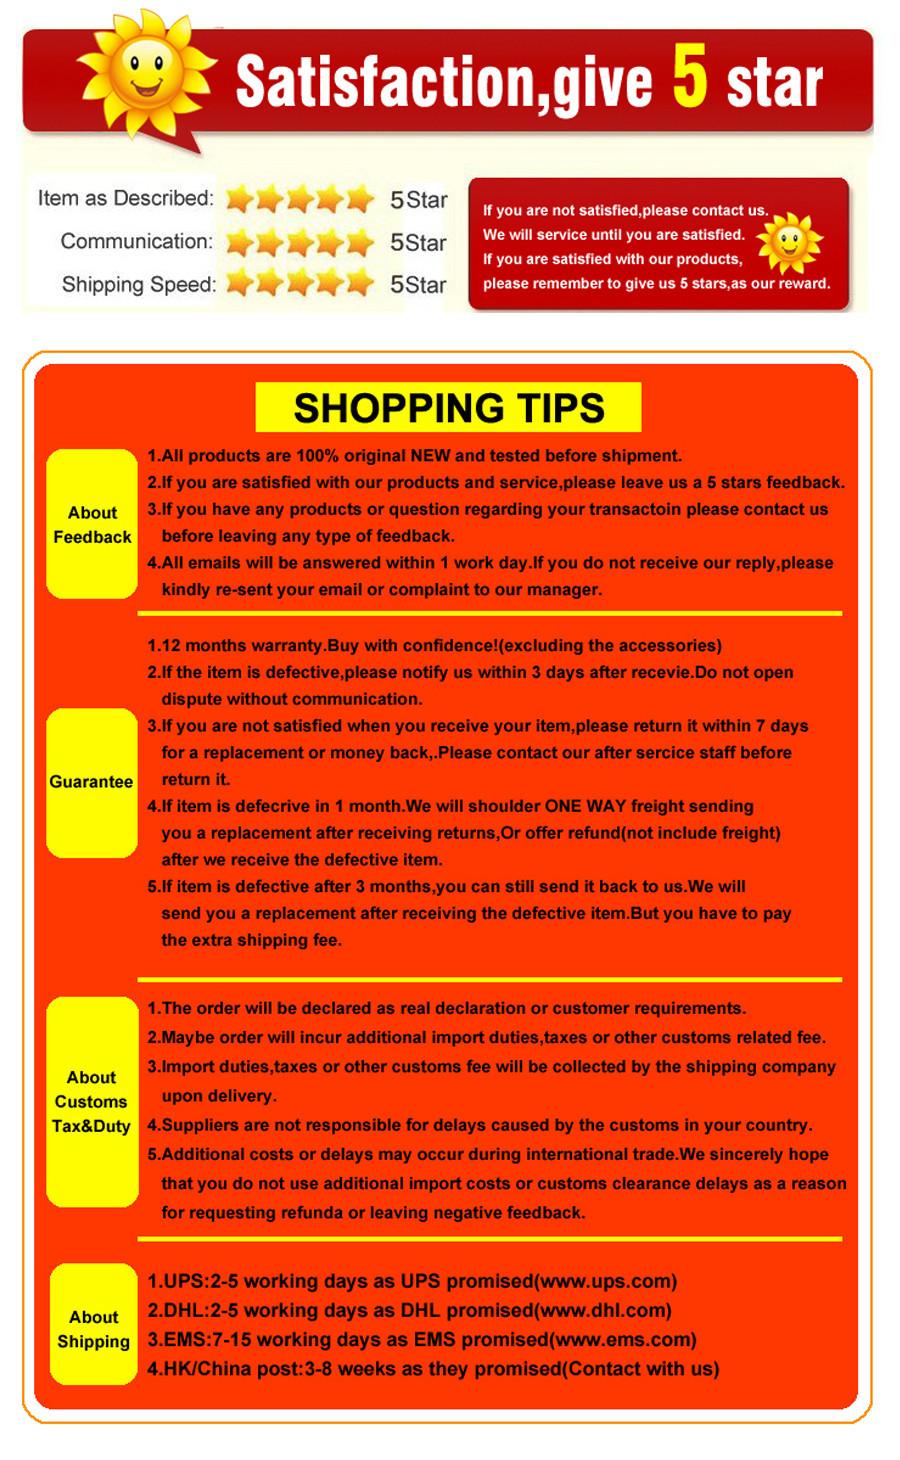 shipping tips 2